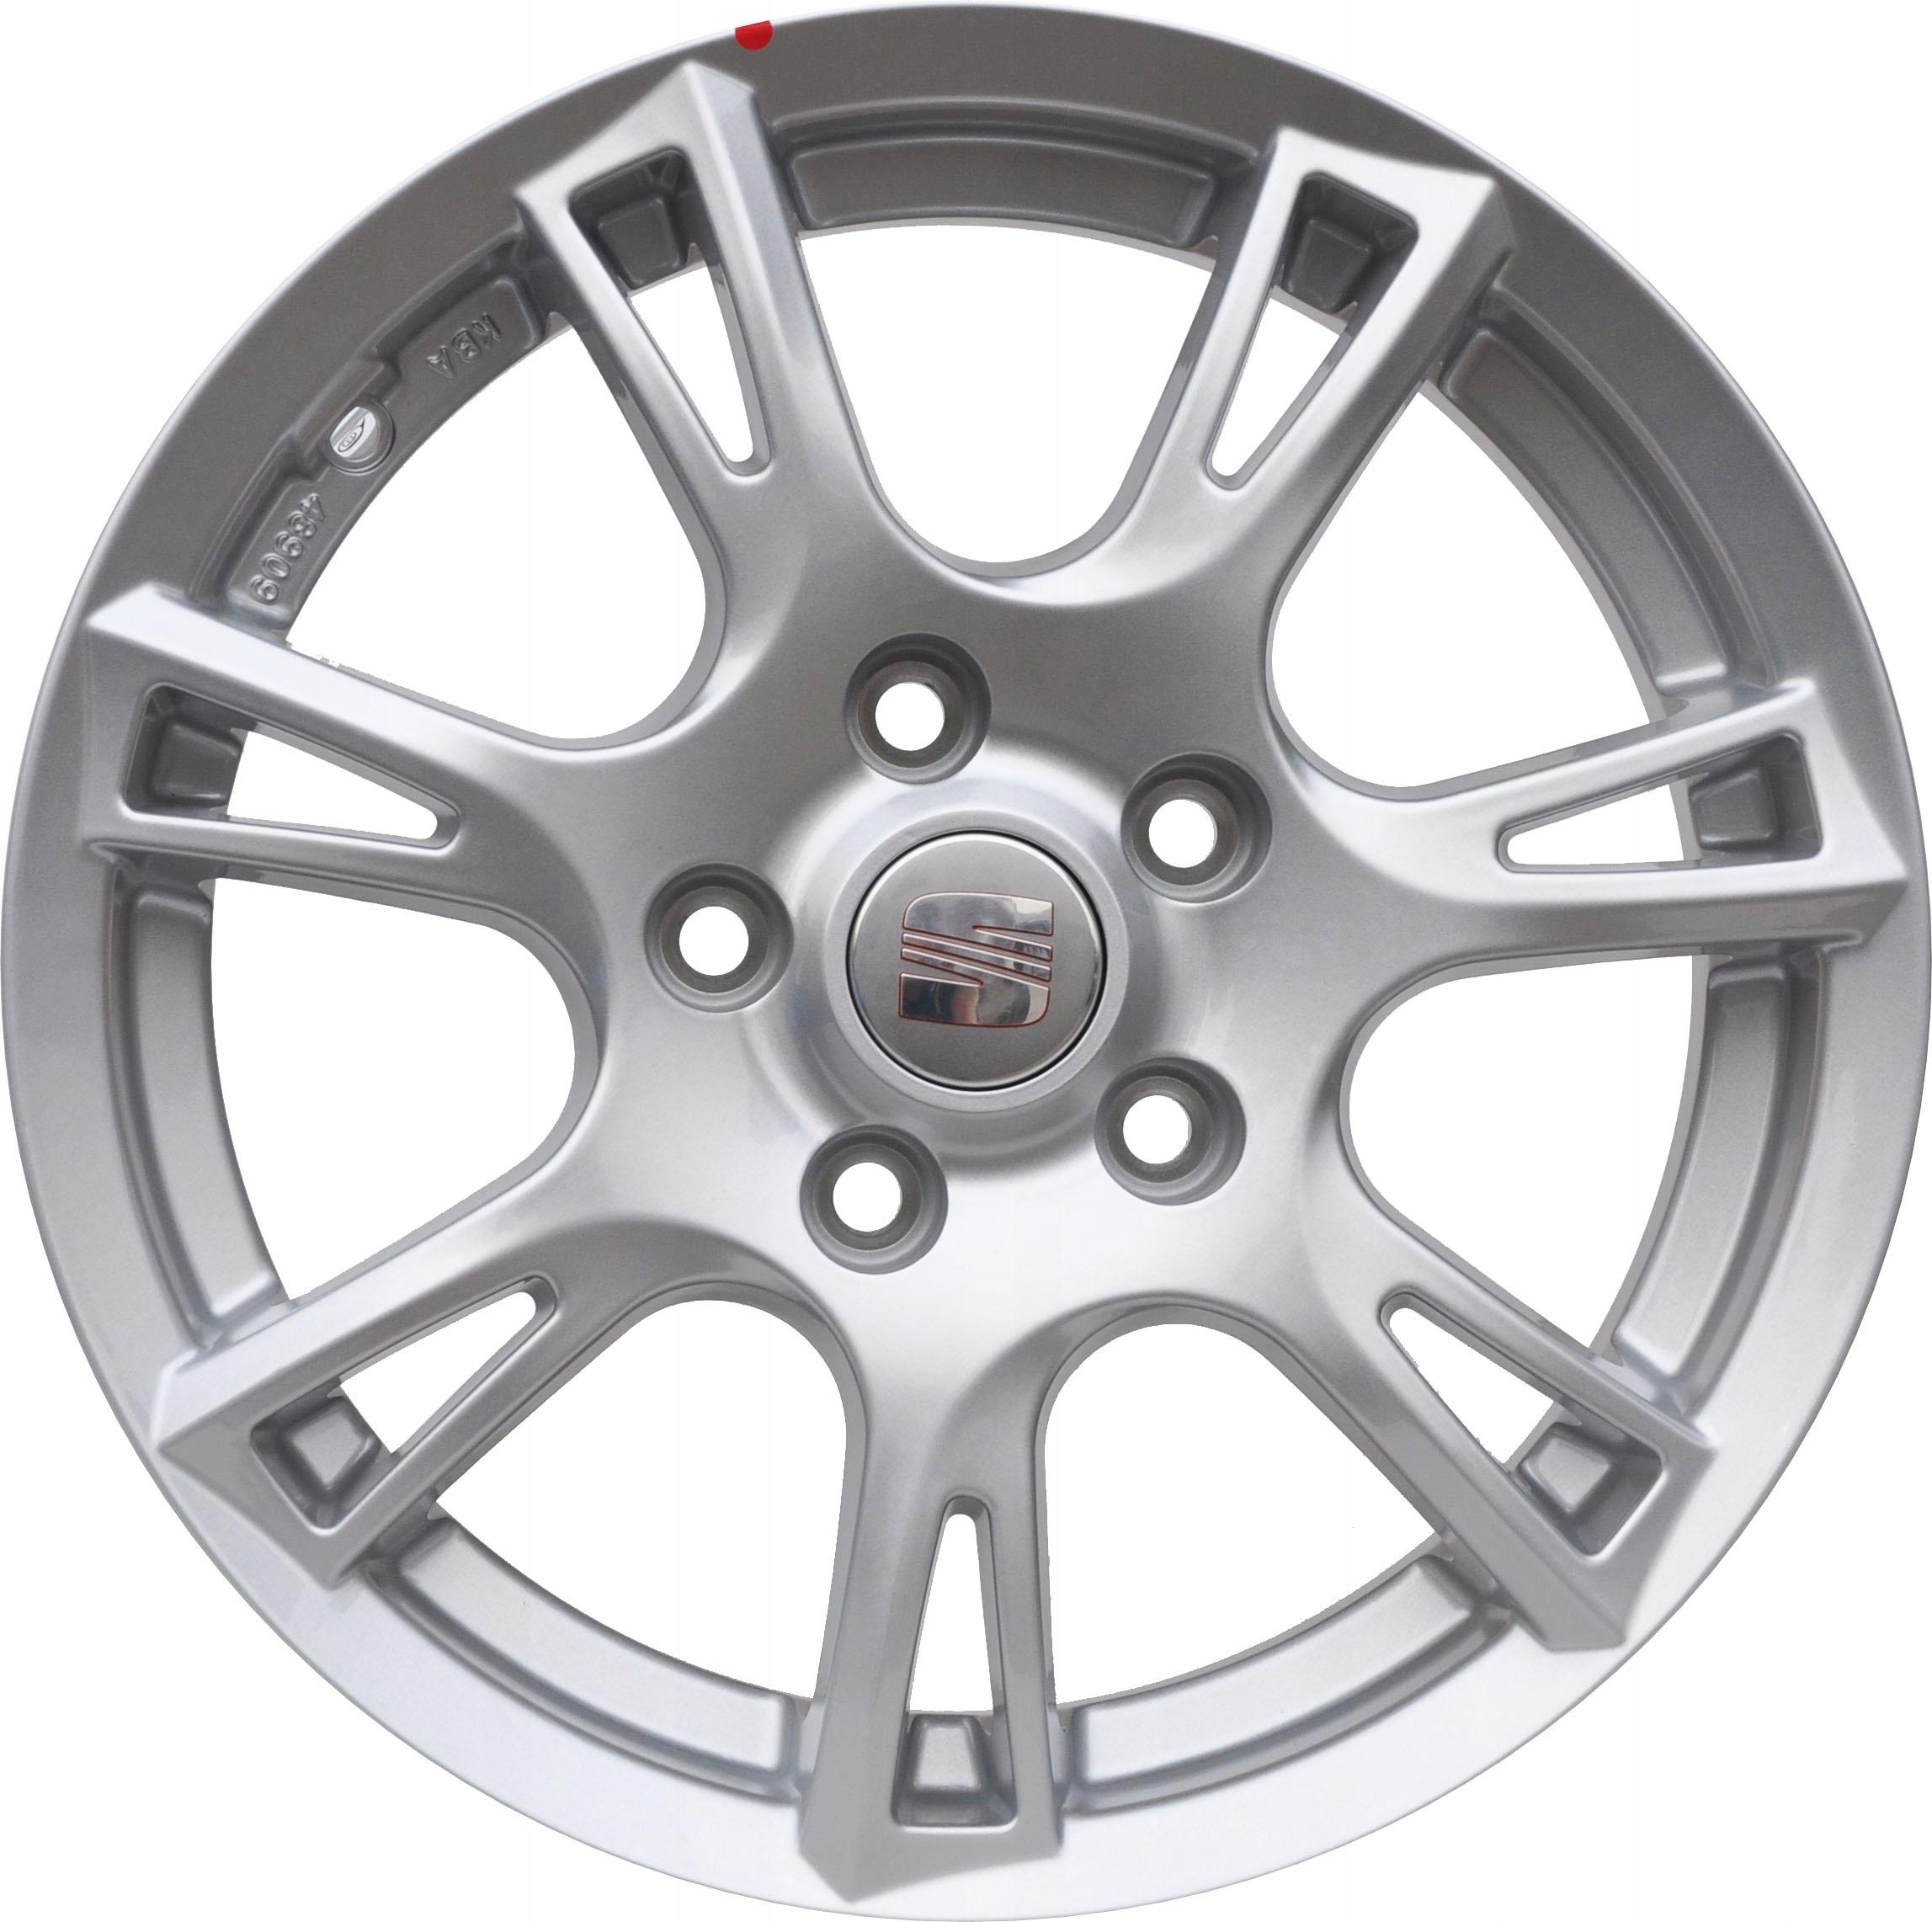 SE016015 S ORYGINALNE FELGI 15 5x112 SEAT LEON VW